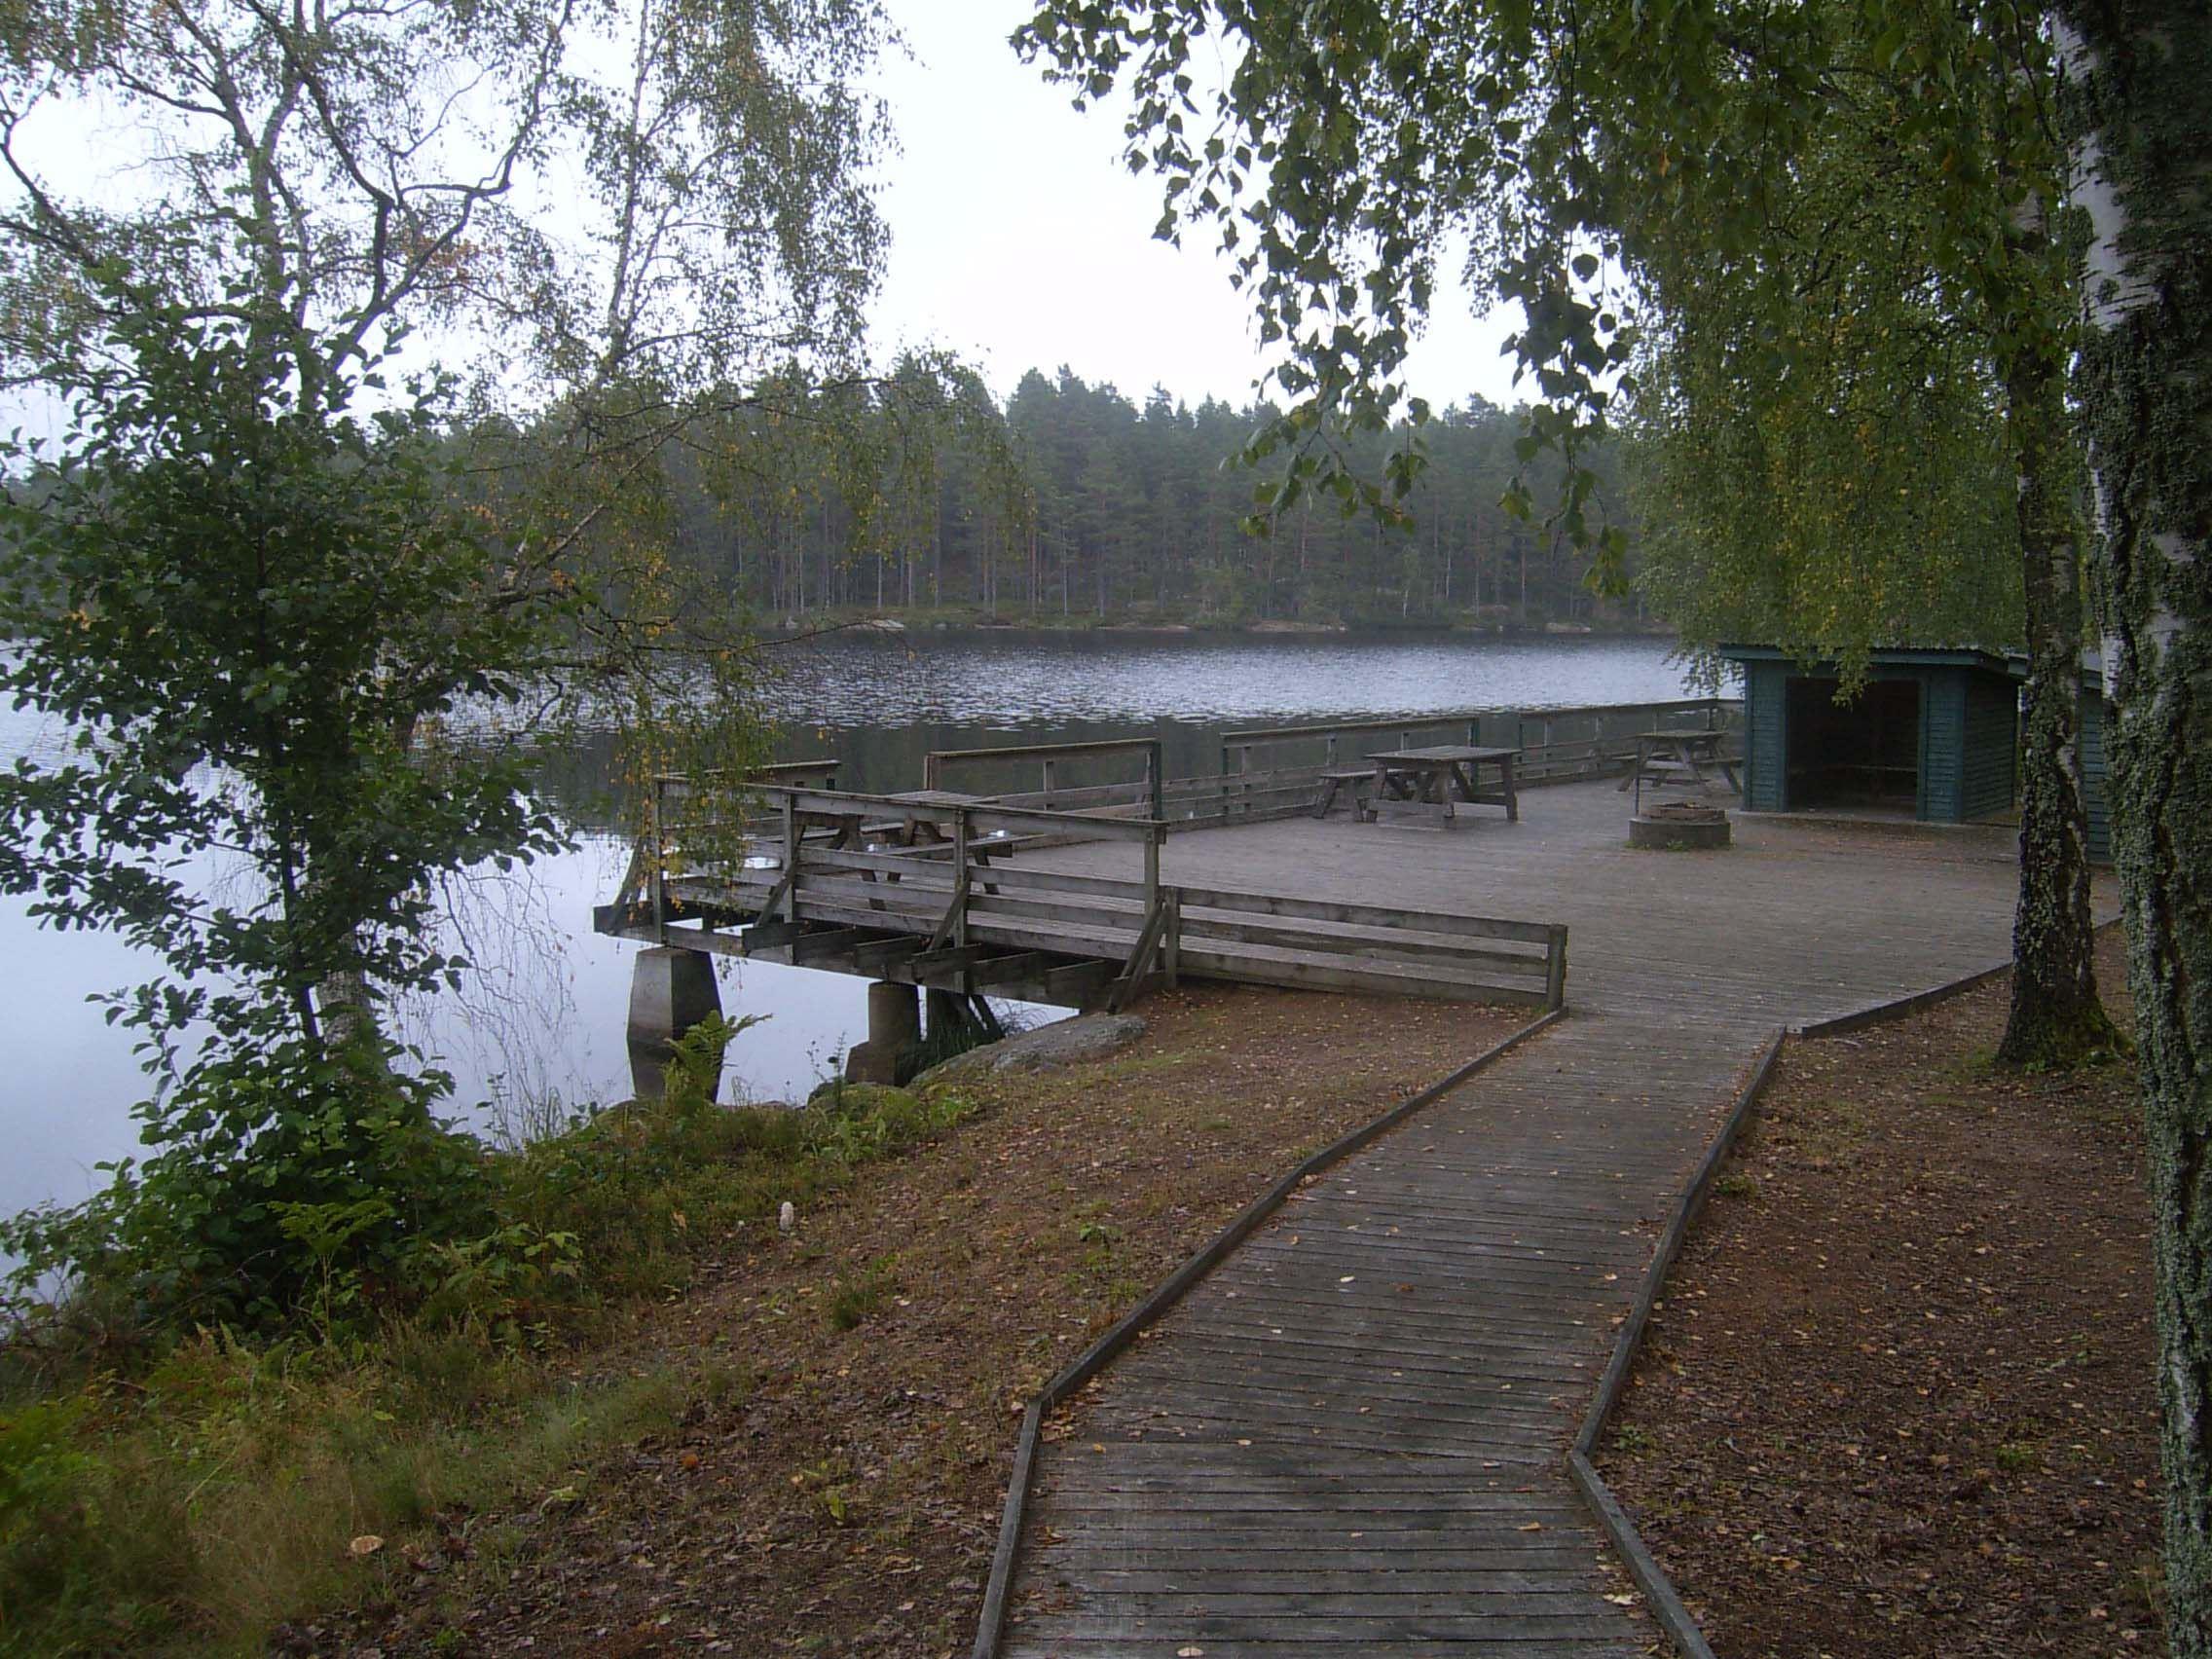 C-J Månsson, Stora Hammarsjön